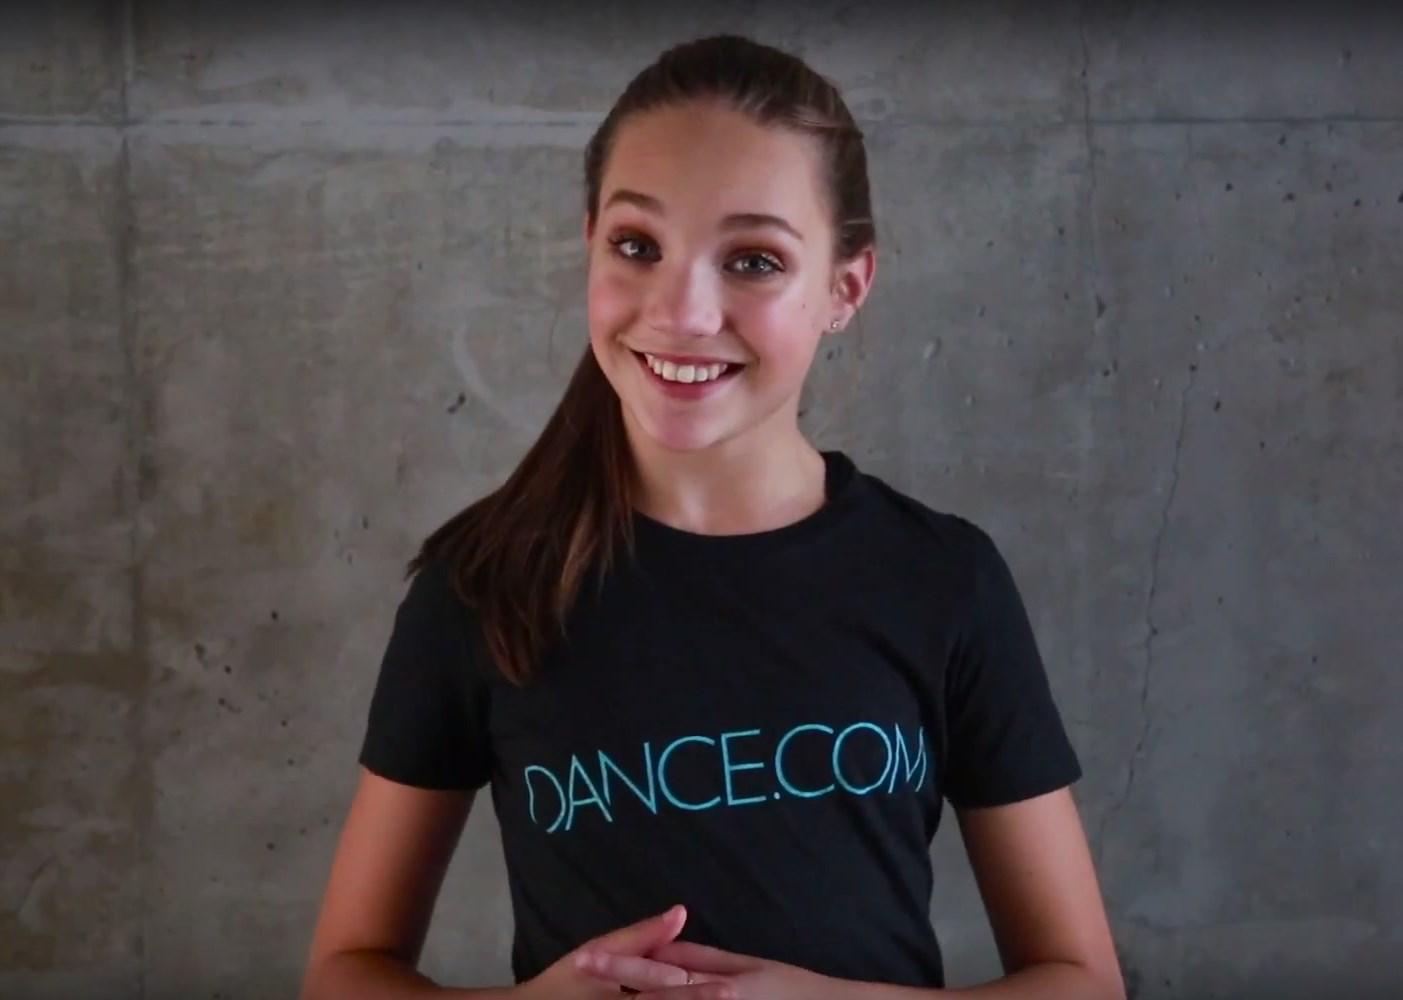 Smart Girl Wallpaper Download Q Amp A With Superstar Dancer Maddie Ziegler Talks Dance